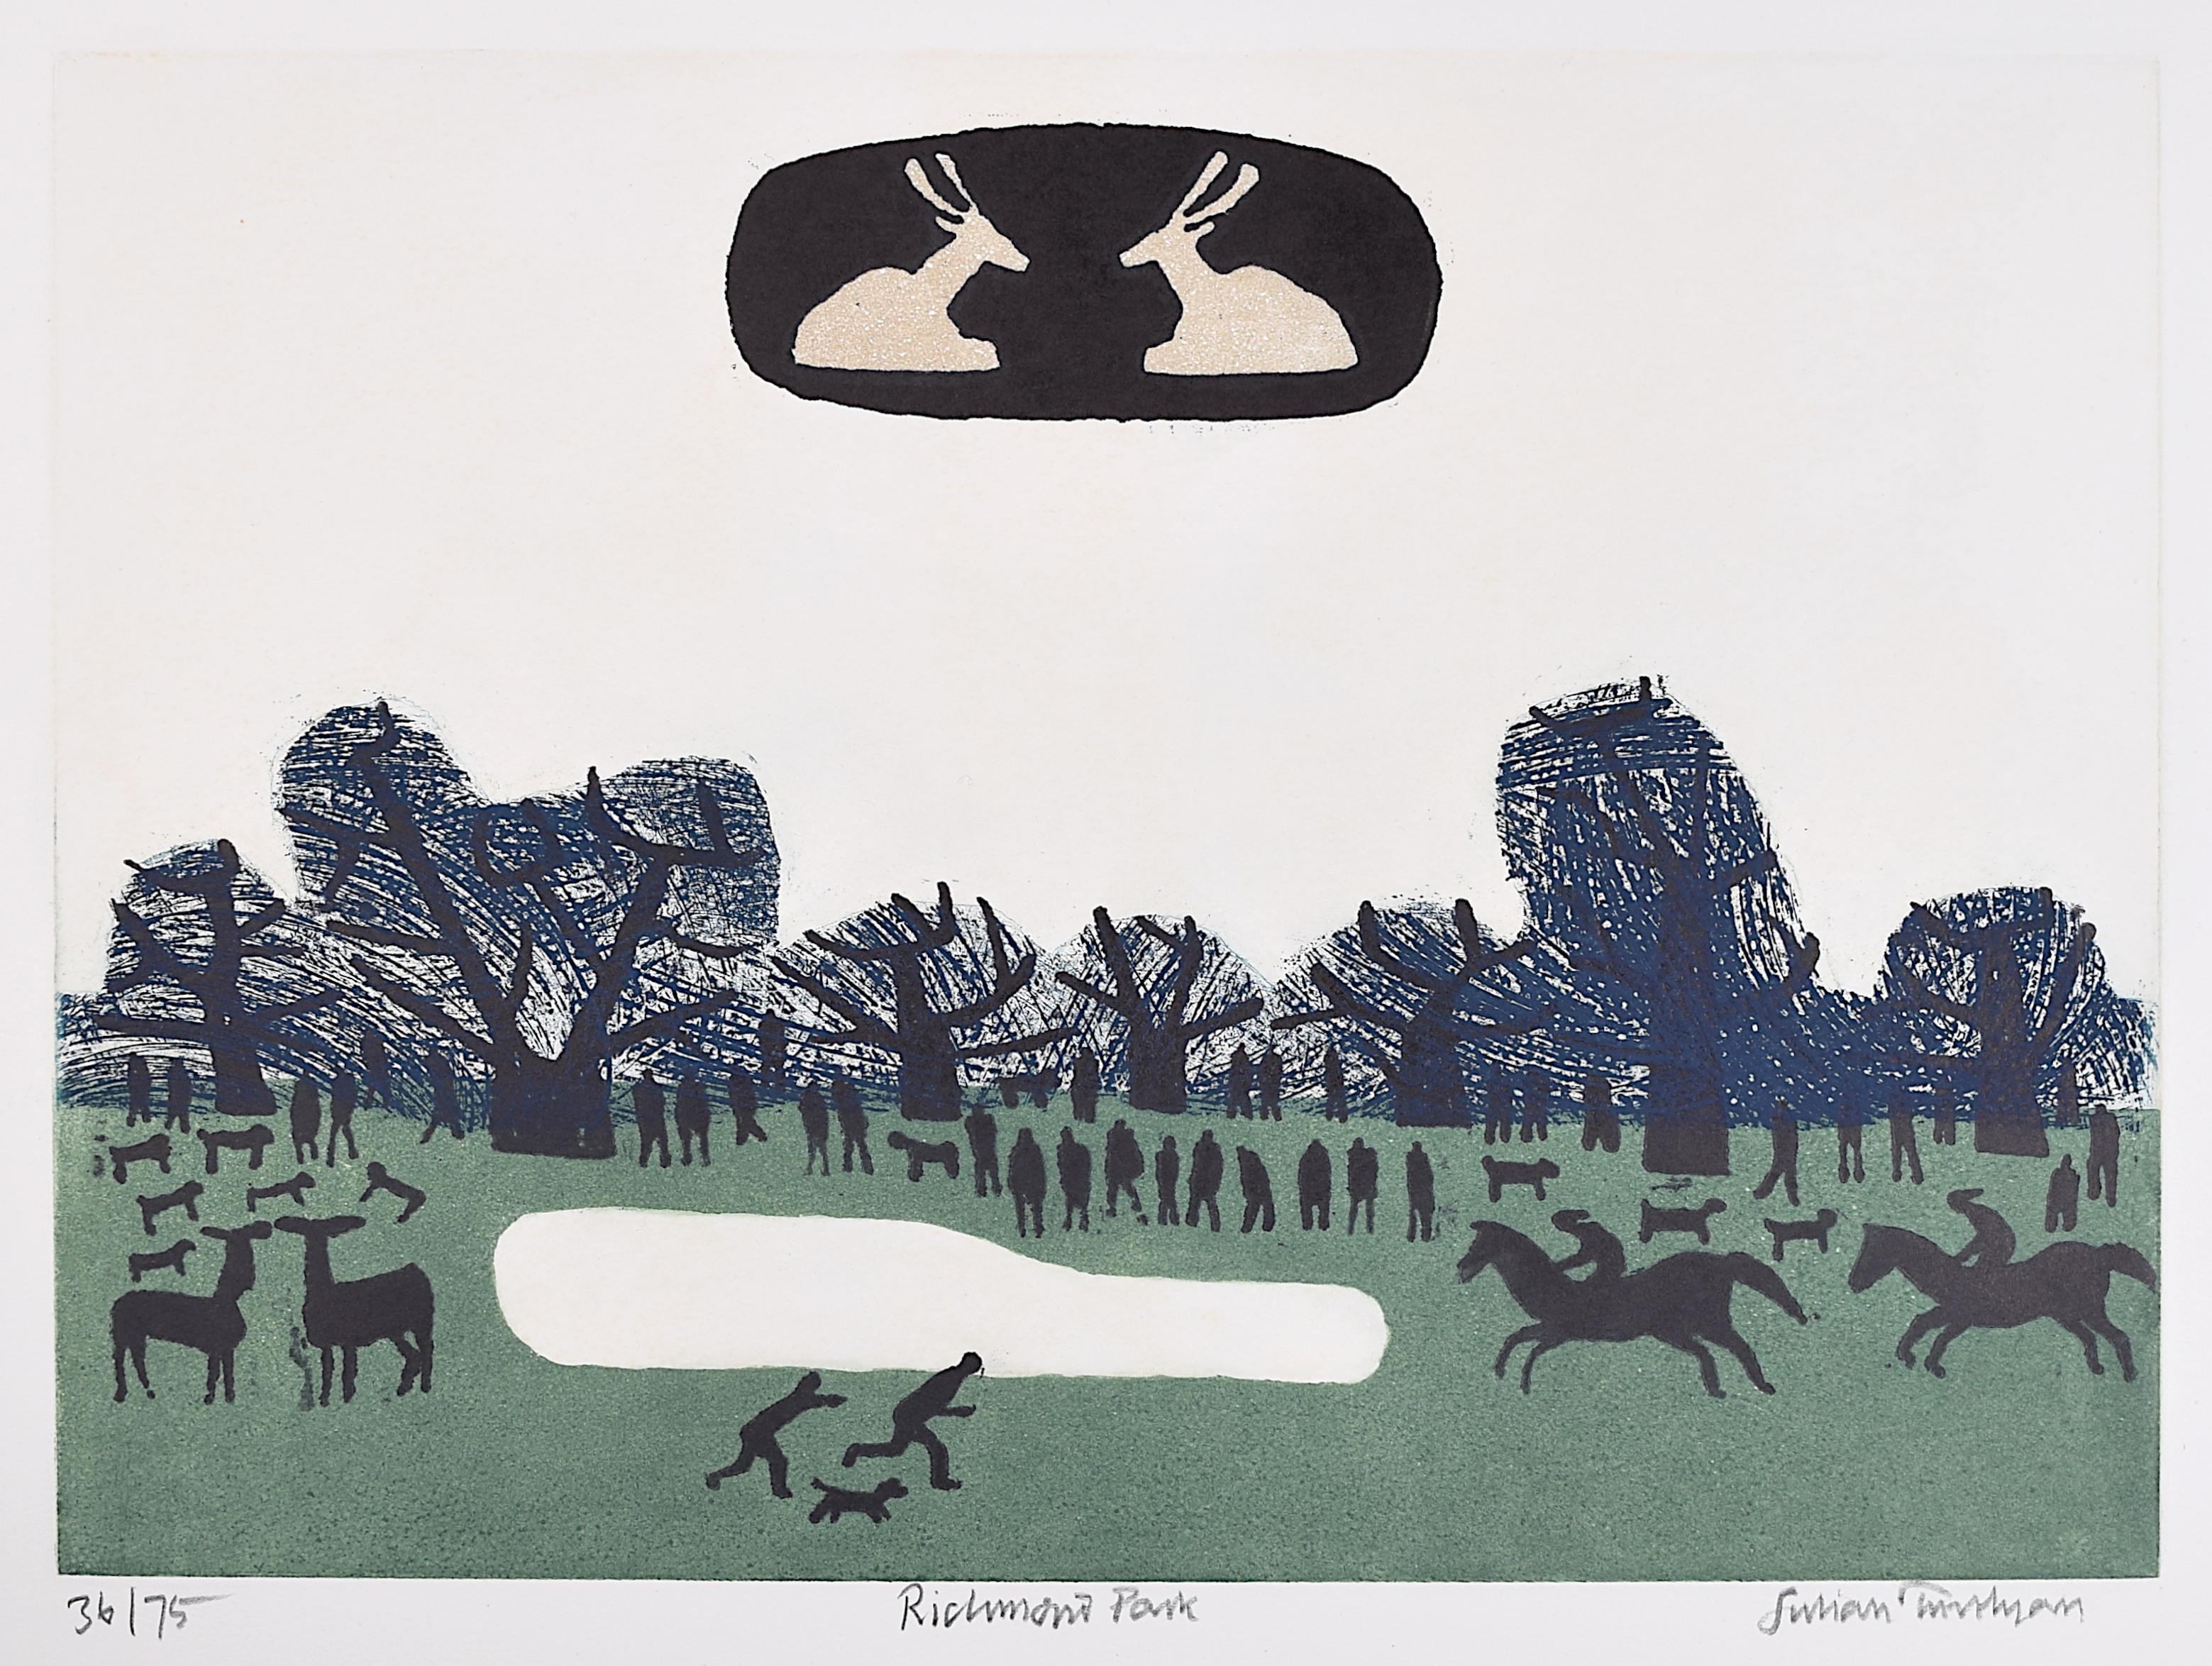 Julian Trevelyan Richmond Park Etching Modern British Art London Print UK Thames